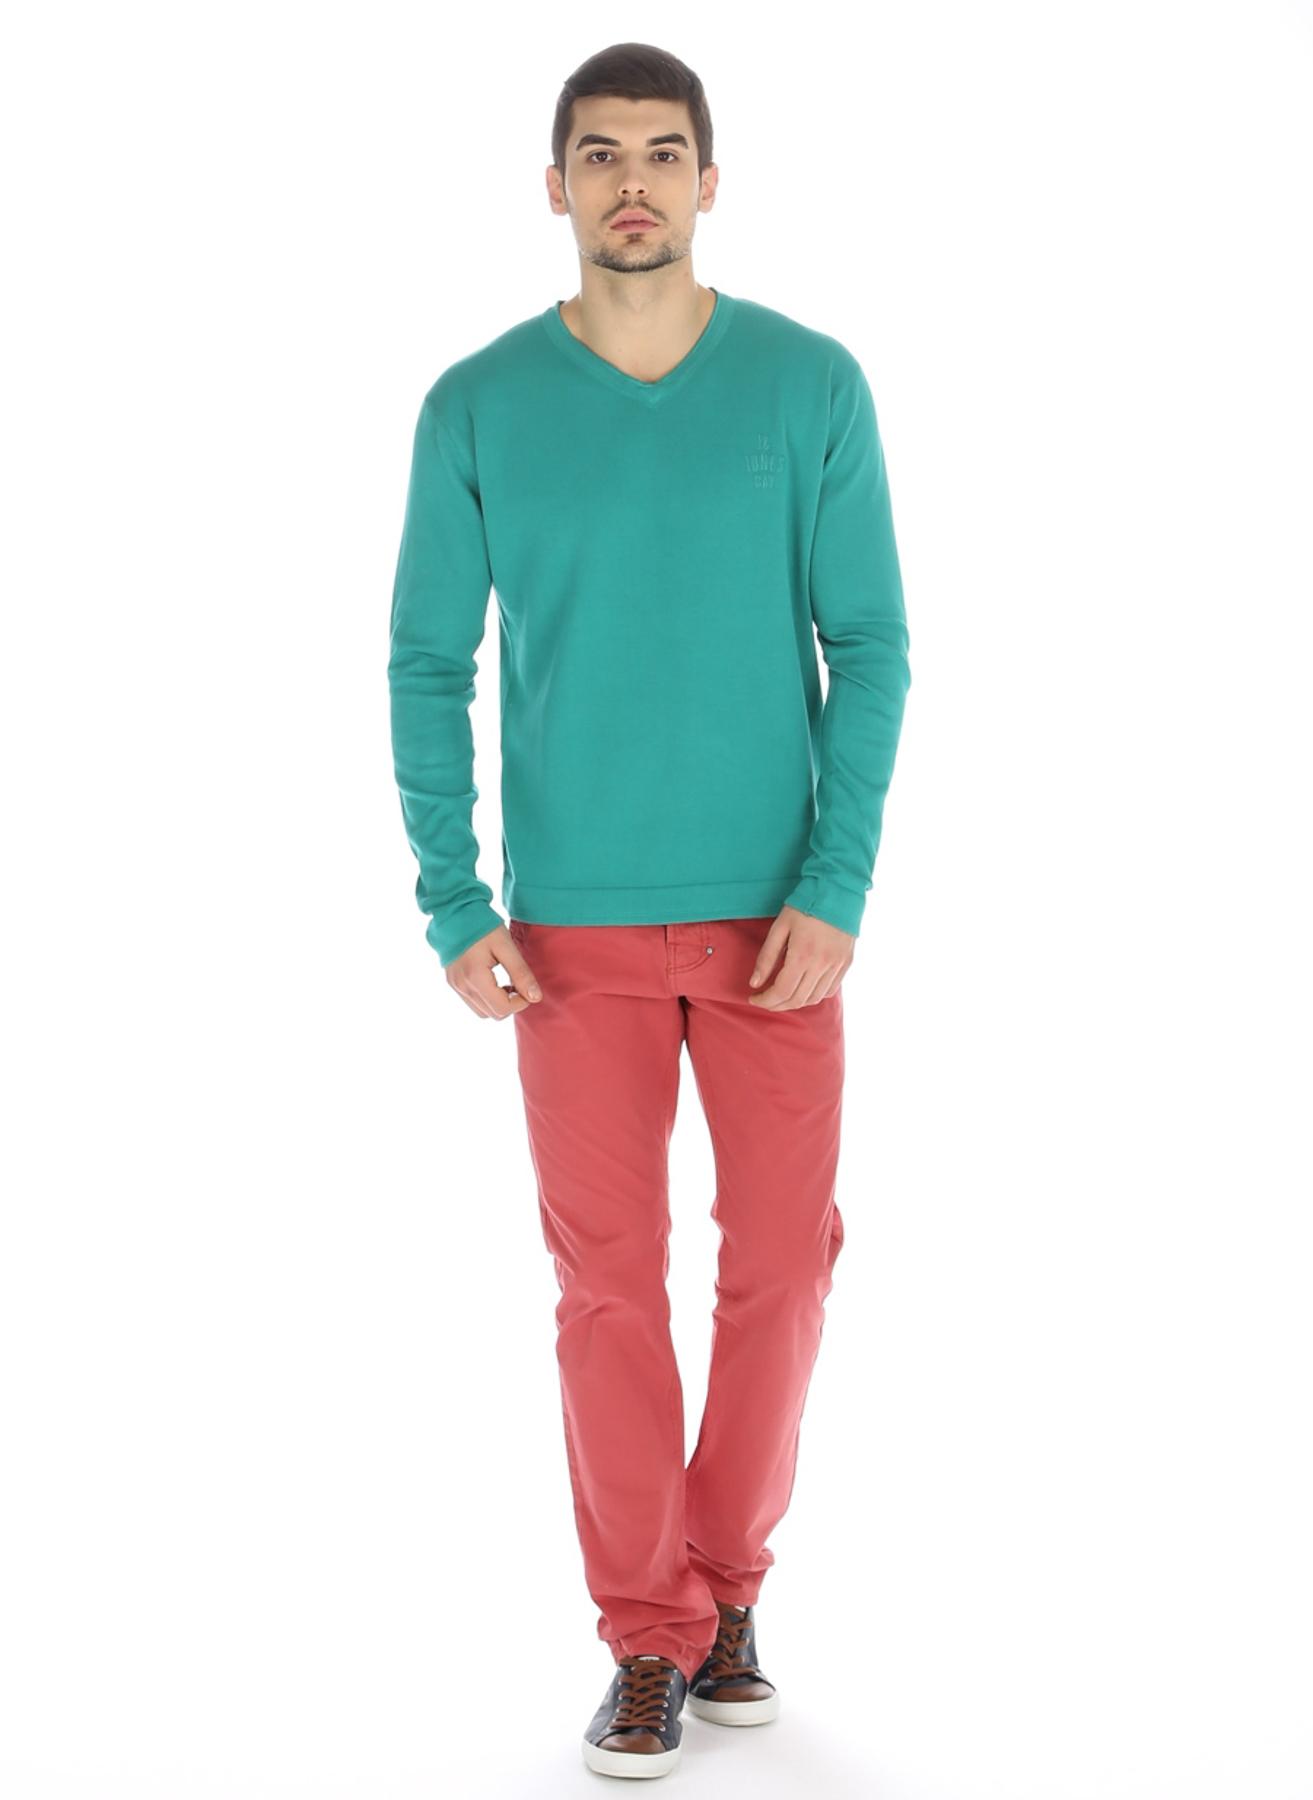 L Yeşil Jack & Jones Kazak 5000031543001 Erkek Giyim Hırka